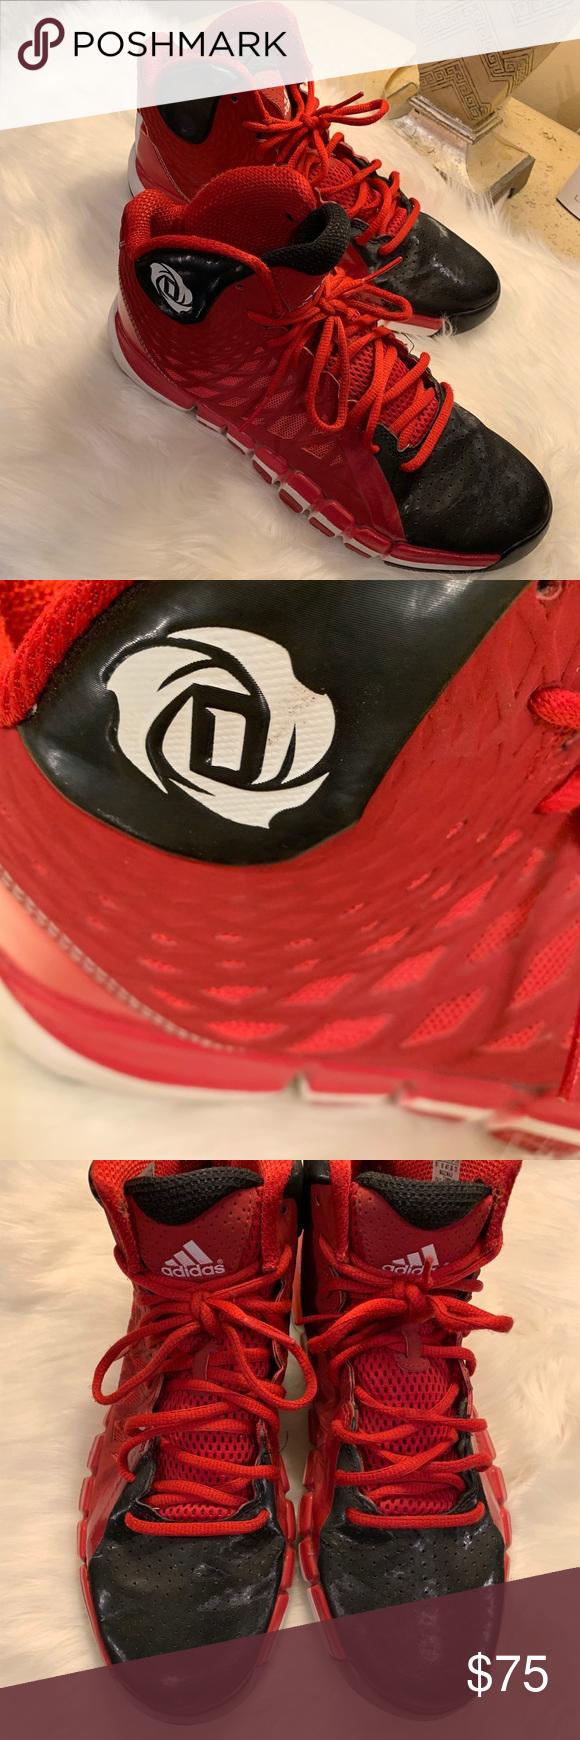 derrick rose adidas sprintweb